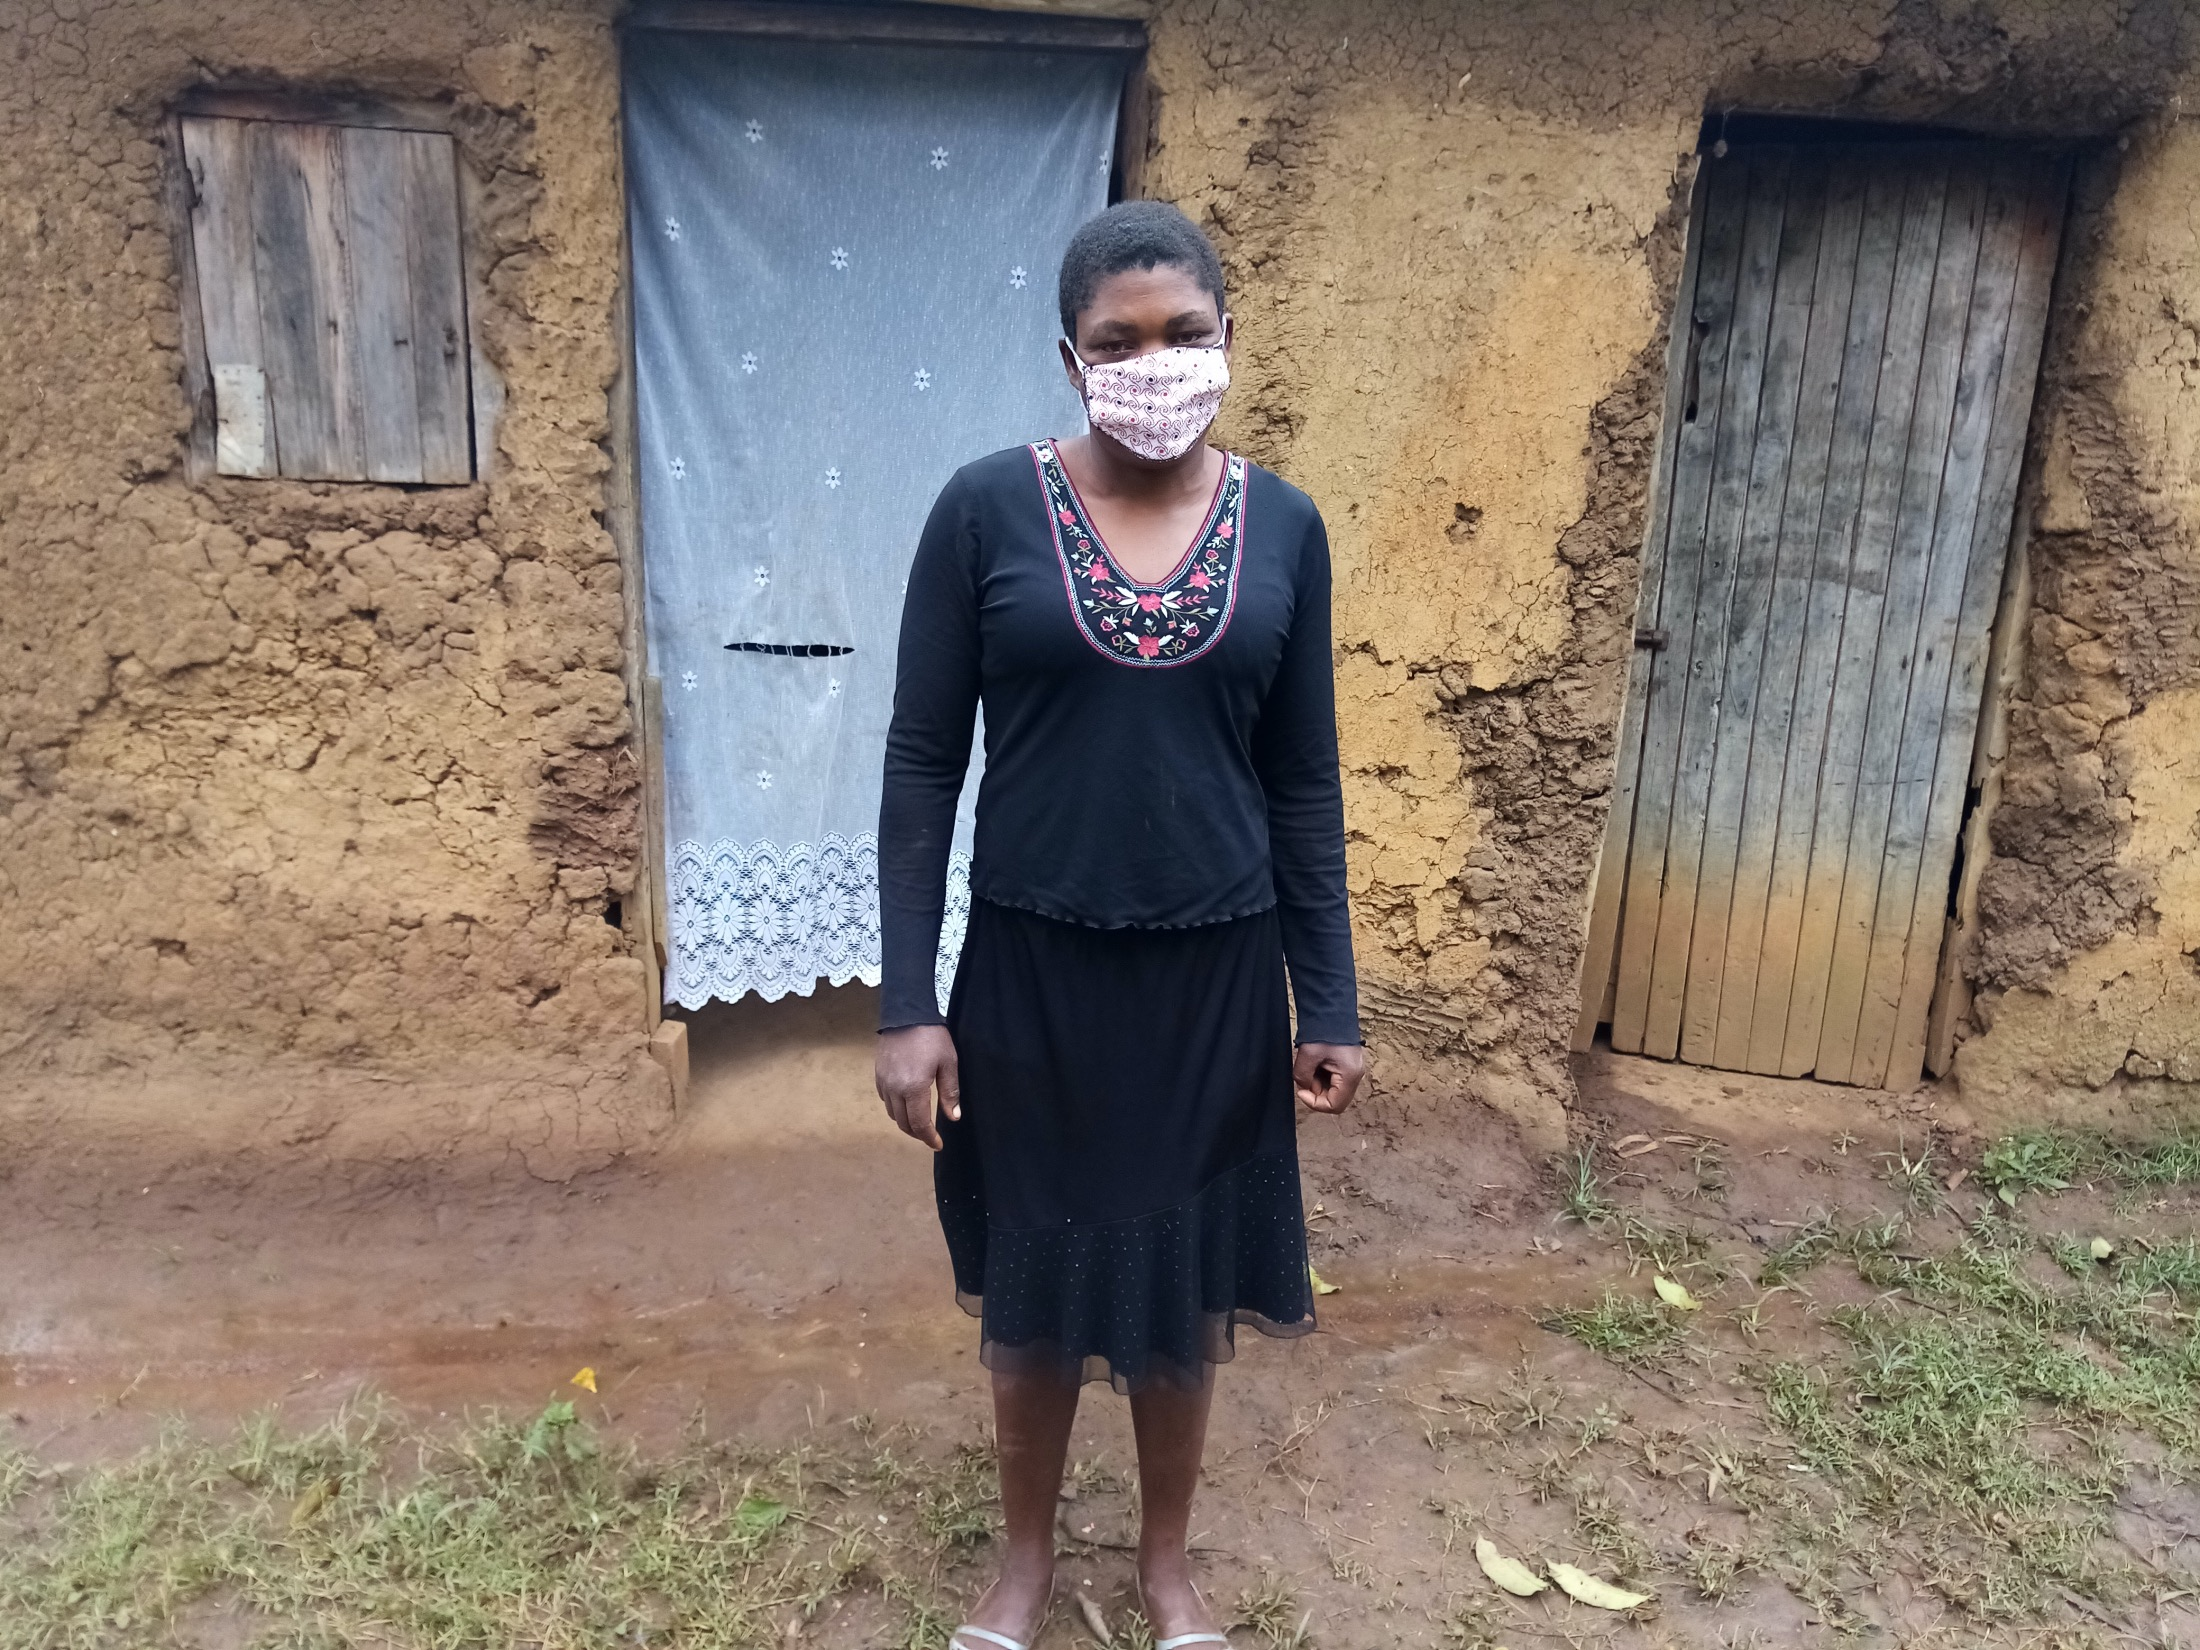 The Water Project : covid19-kenya4107-nanjira-melvin-wearing-a-face-mask